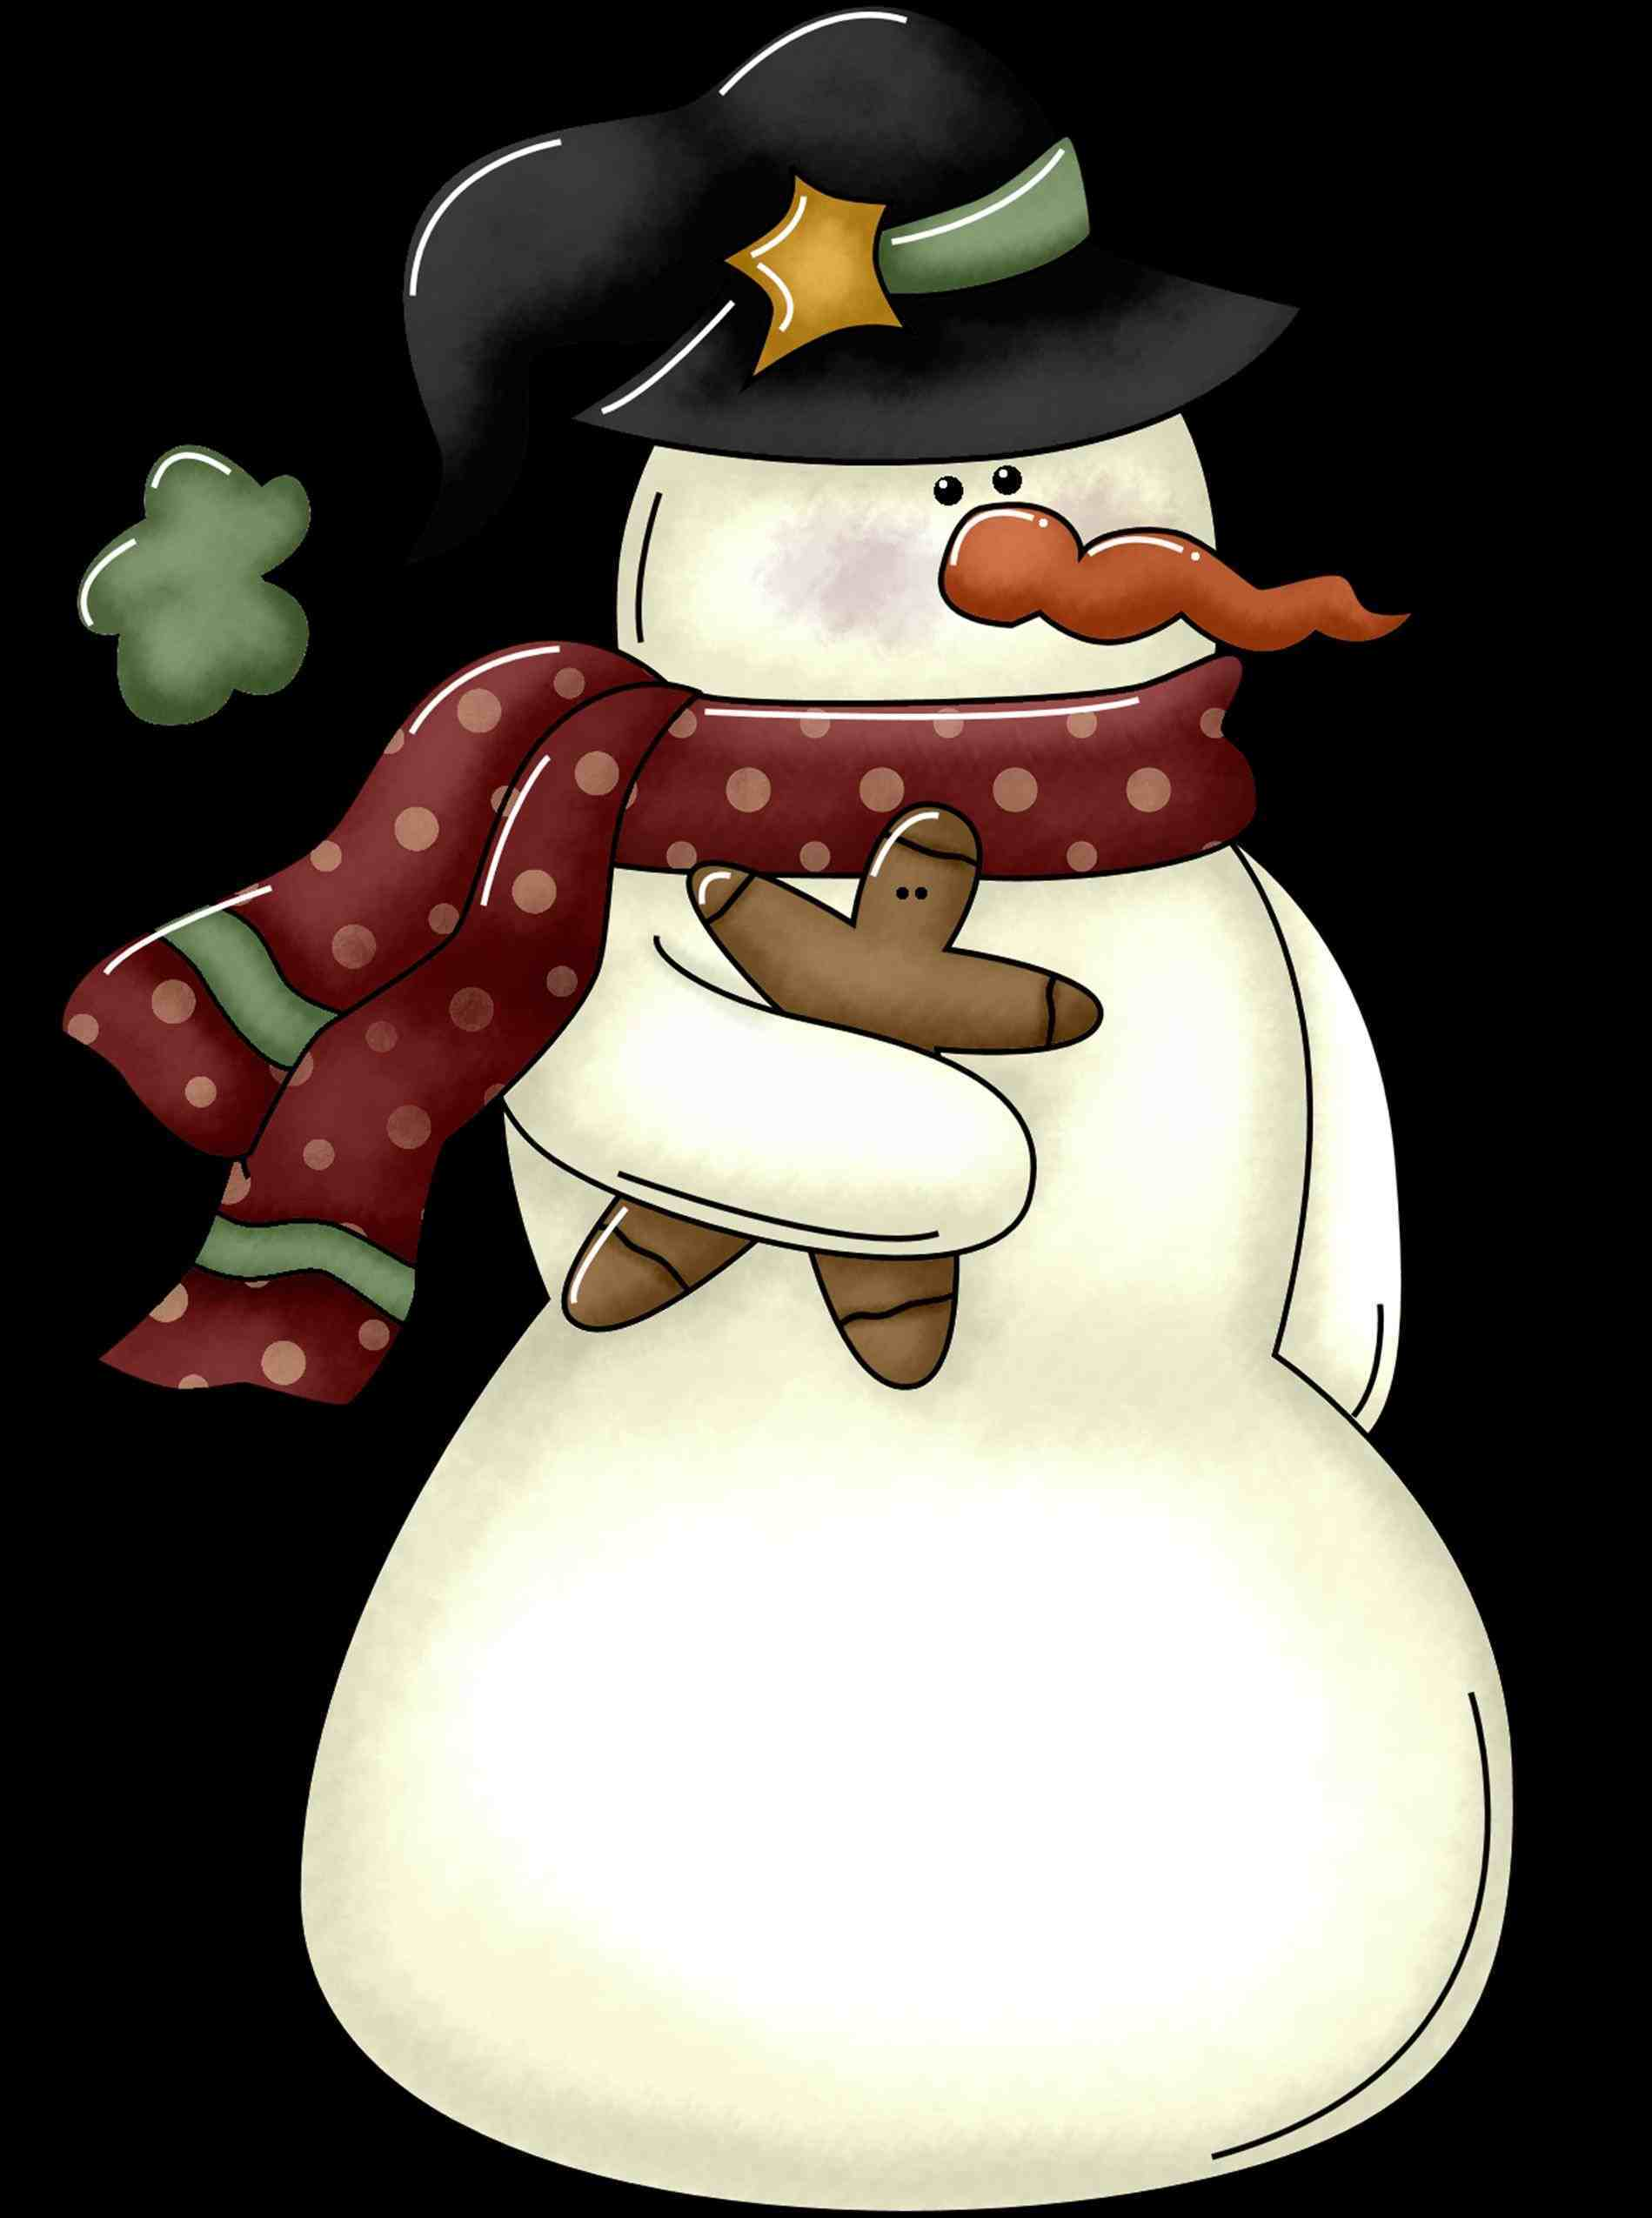 Calendar clipart kid. Country snowman wine bottle